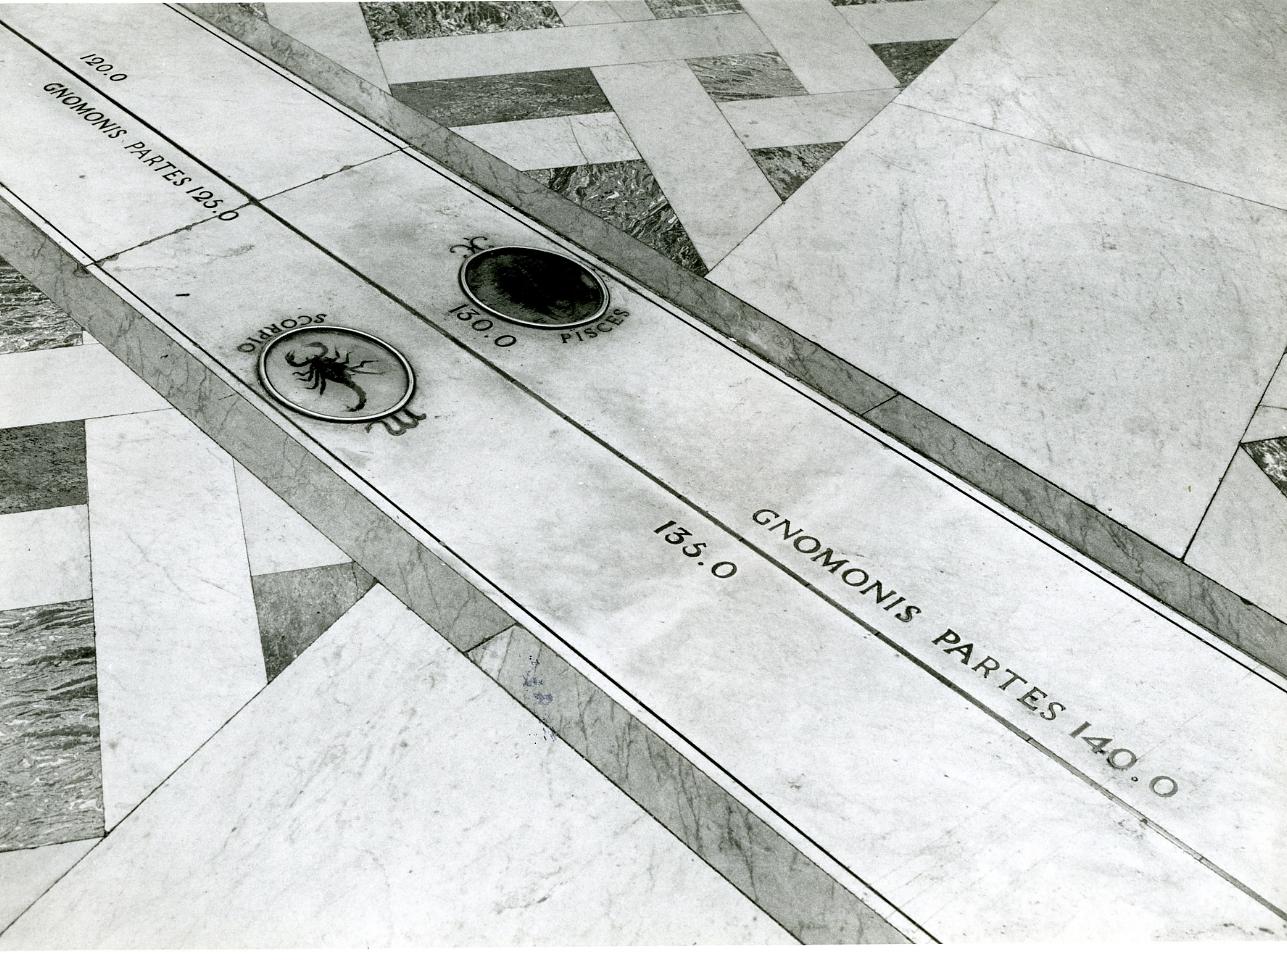 Meridiana Astronomica (pavimento) di Schiantarelli Pompeo (fine sec. XVIII)